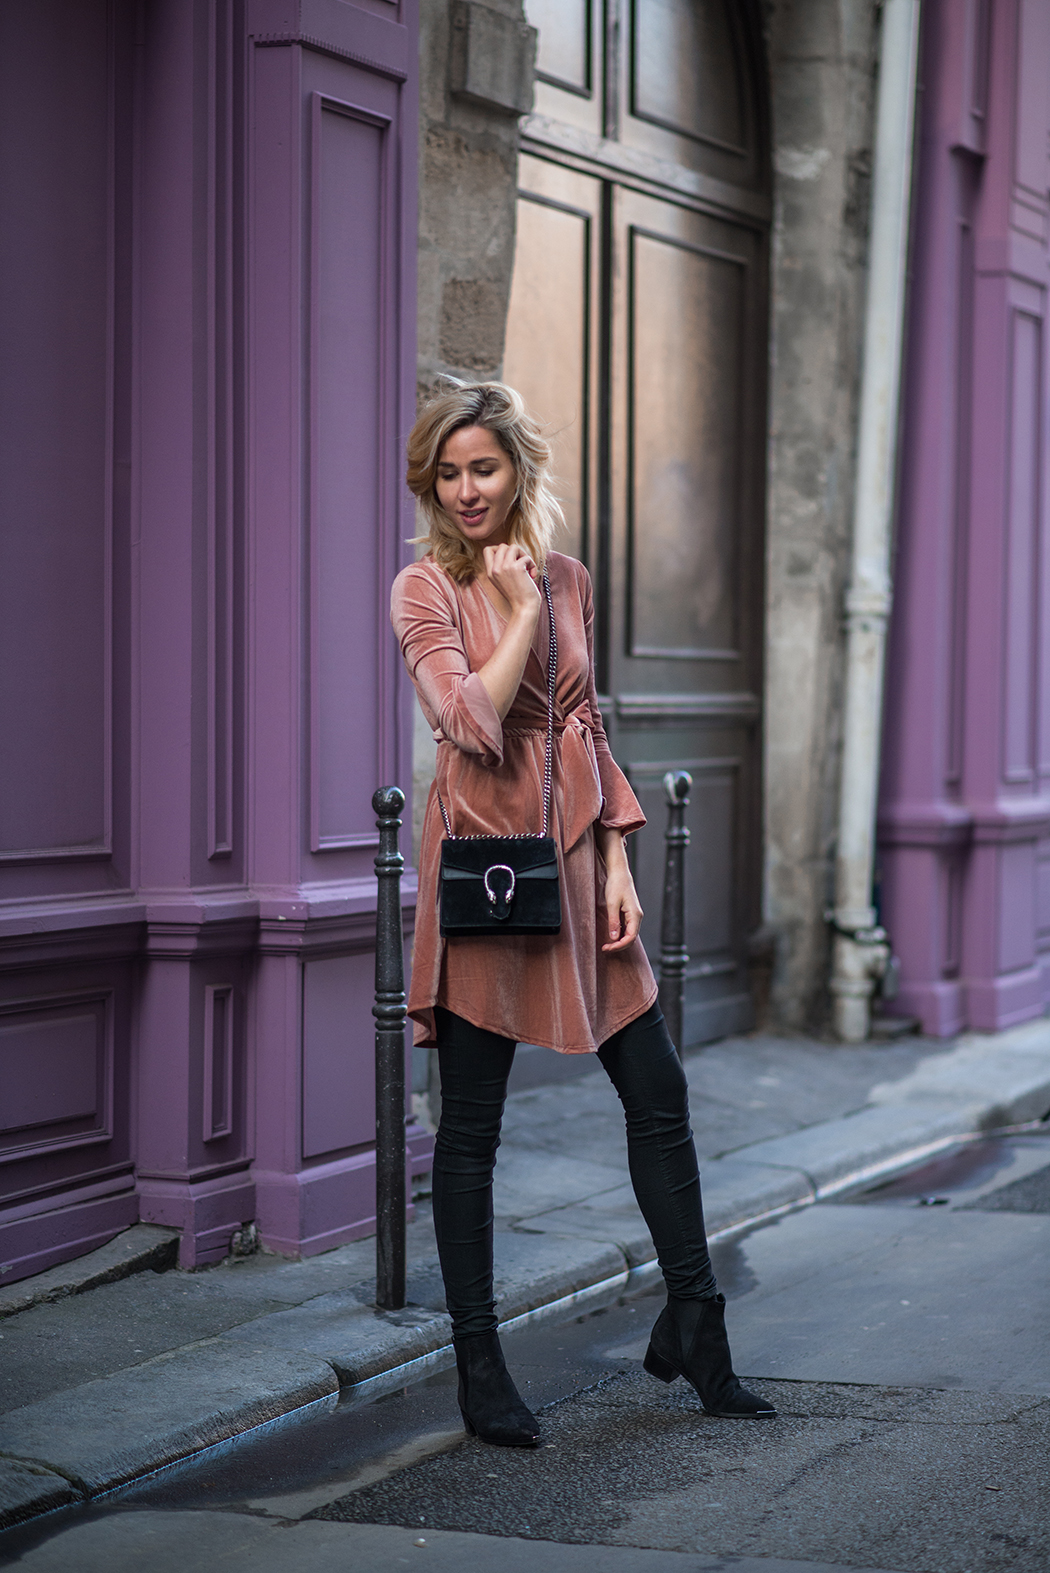 fashionblog-fashionblogger-fashion-blog-blogger-modeblogger-paris-samt-velvet-lindarella-9-web